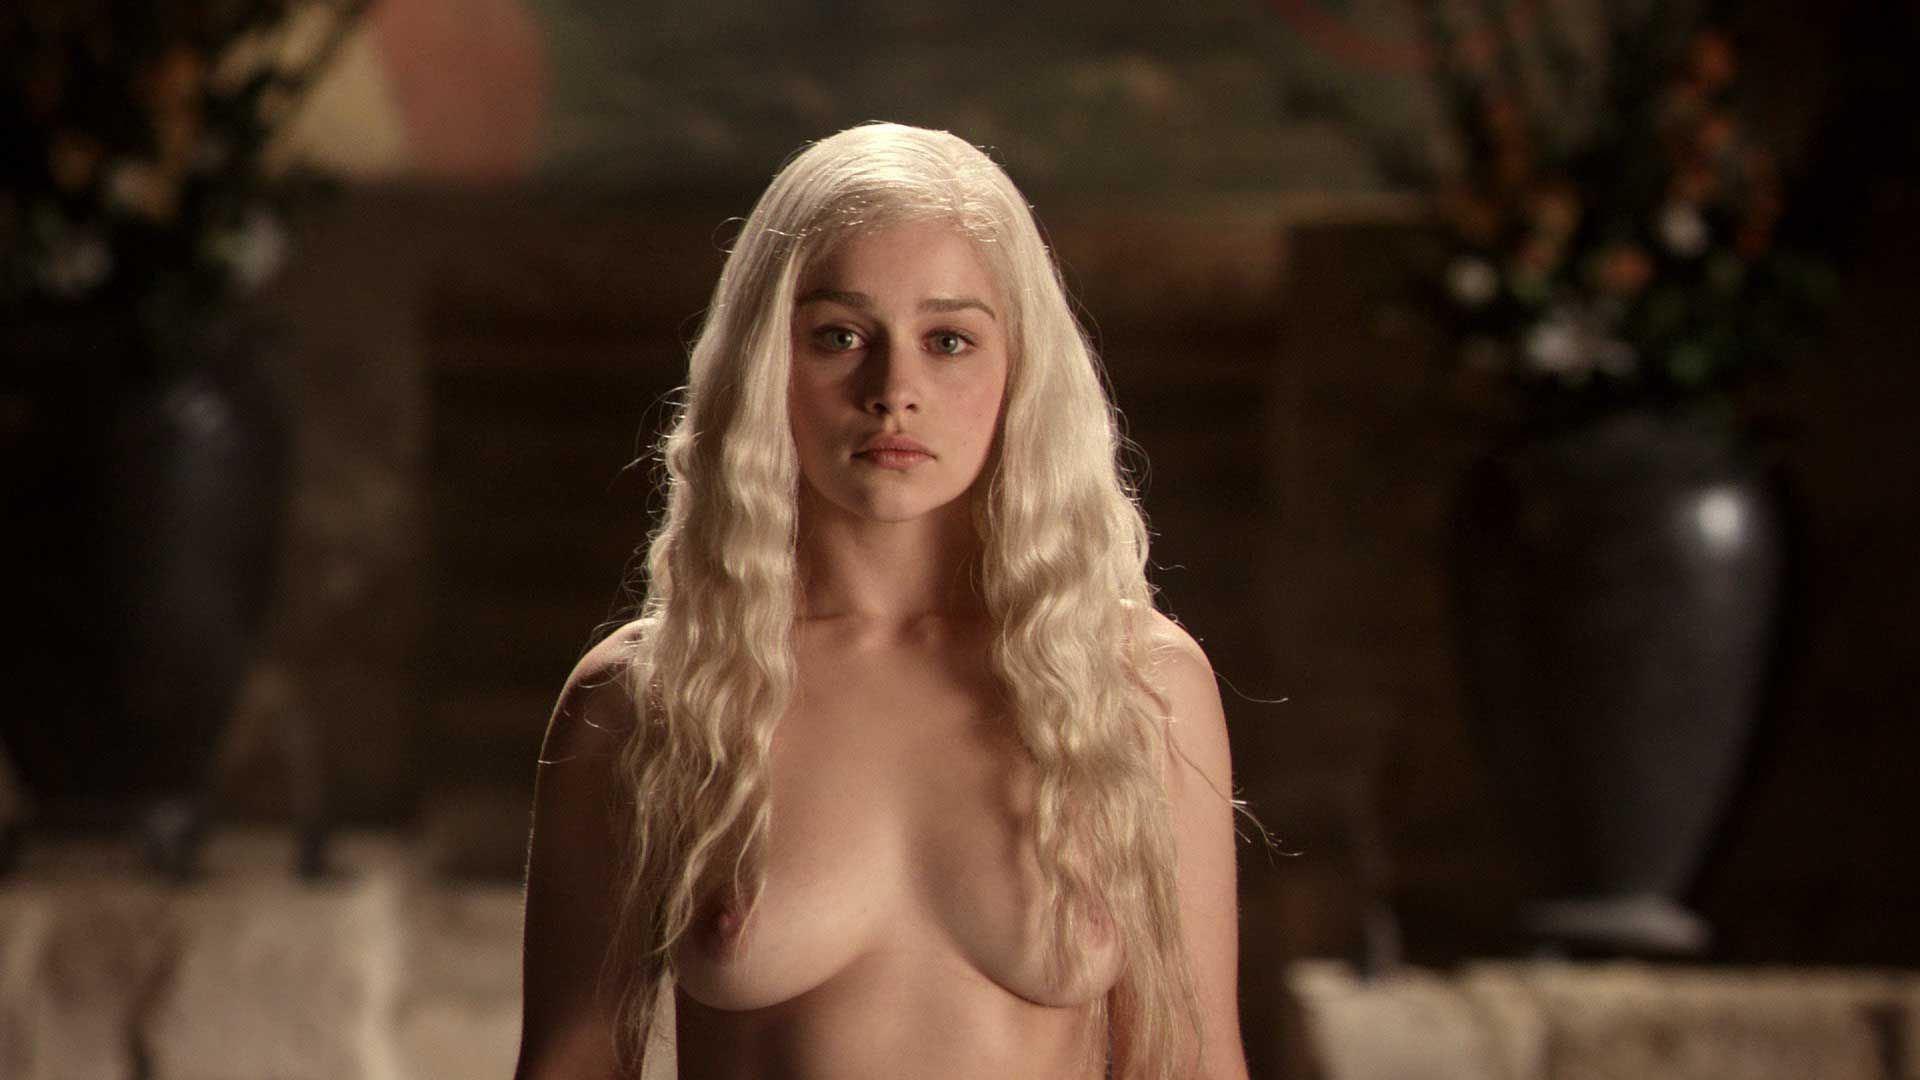 Daenerys nude pics